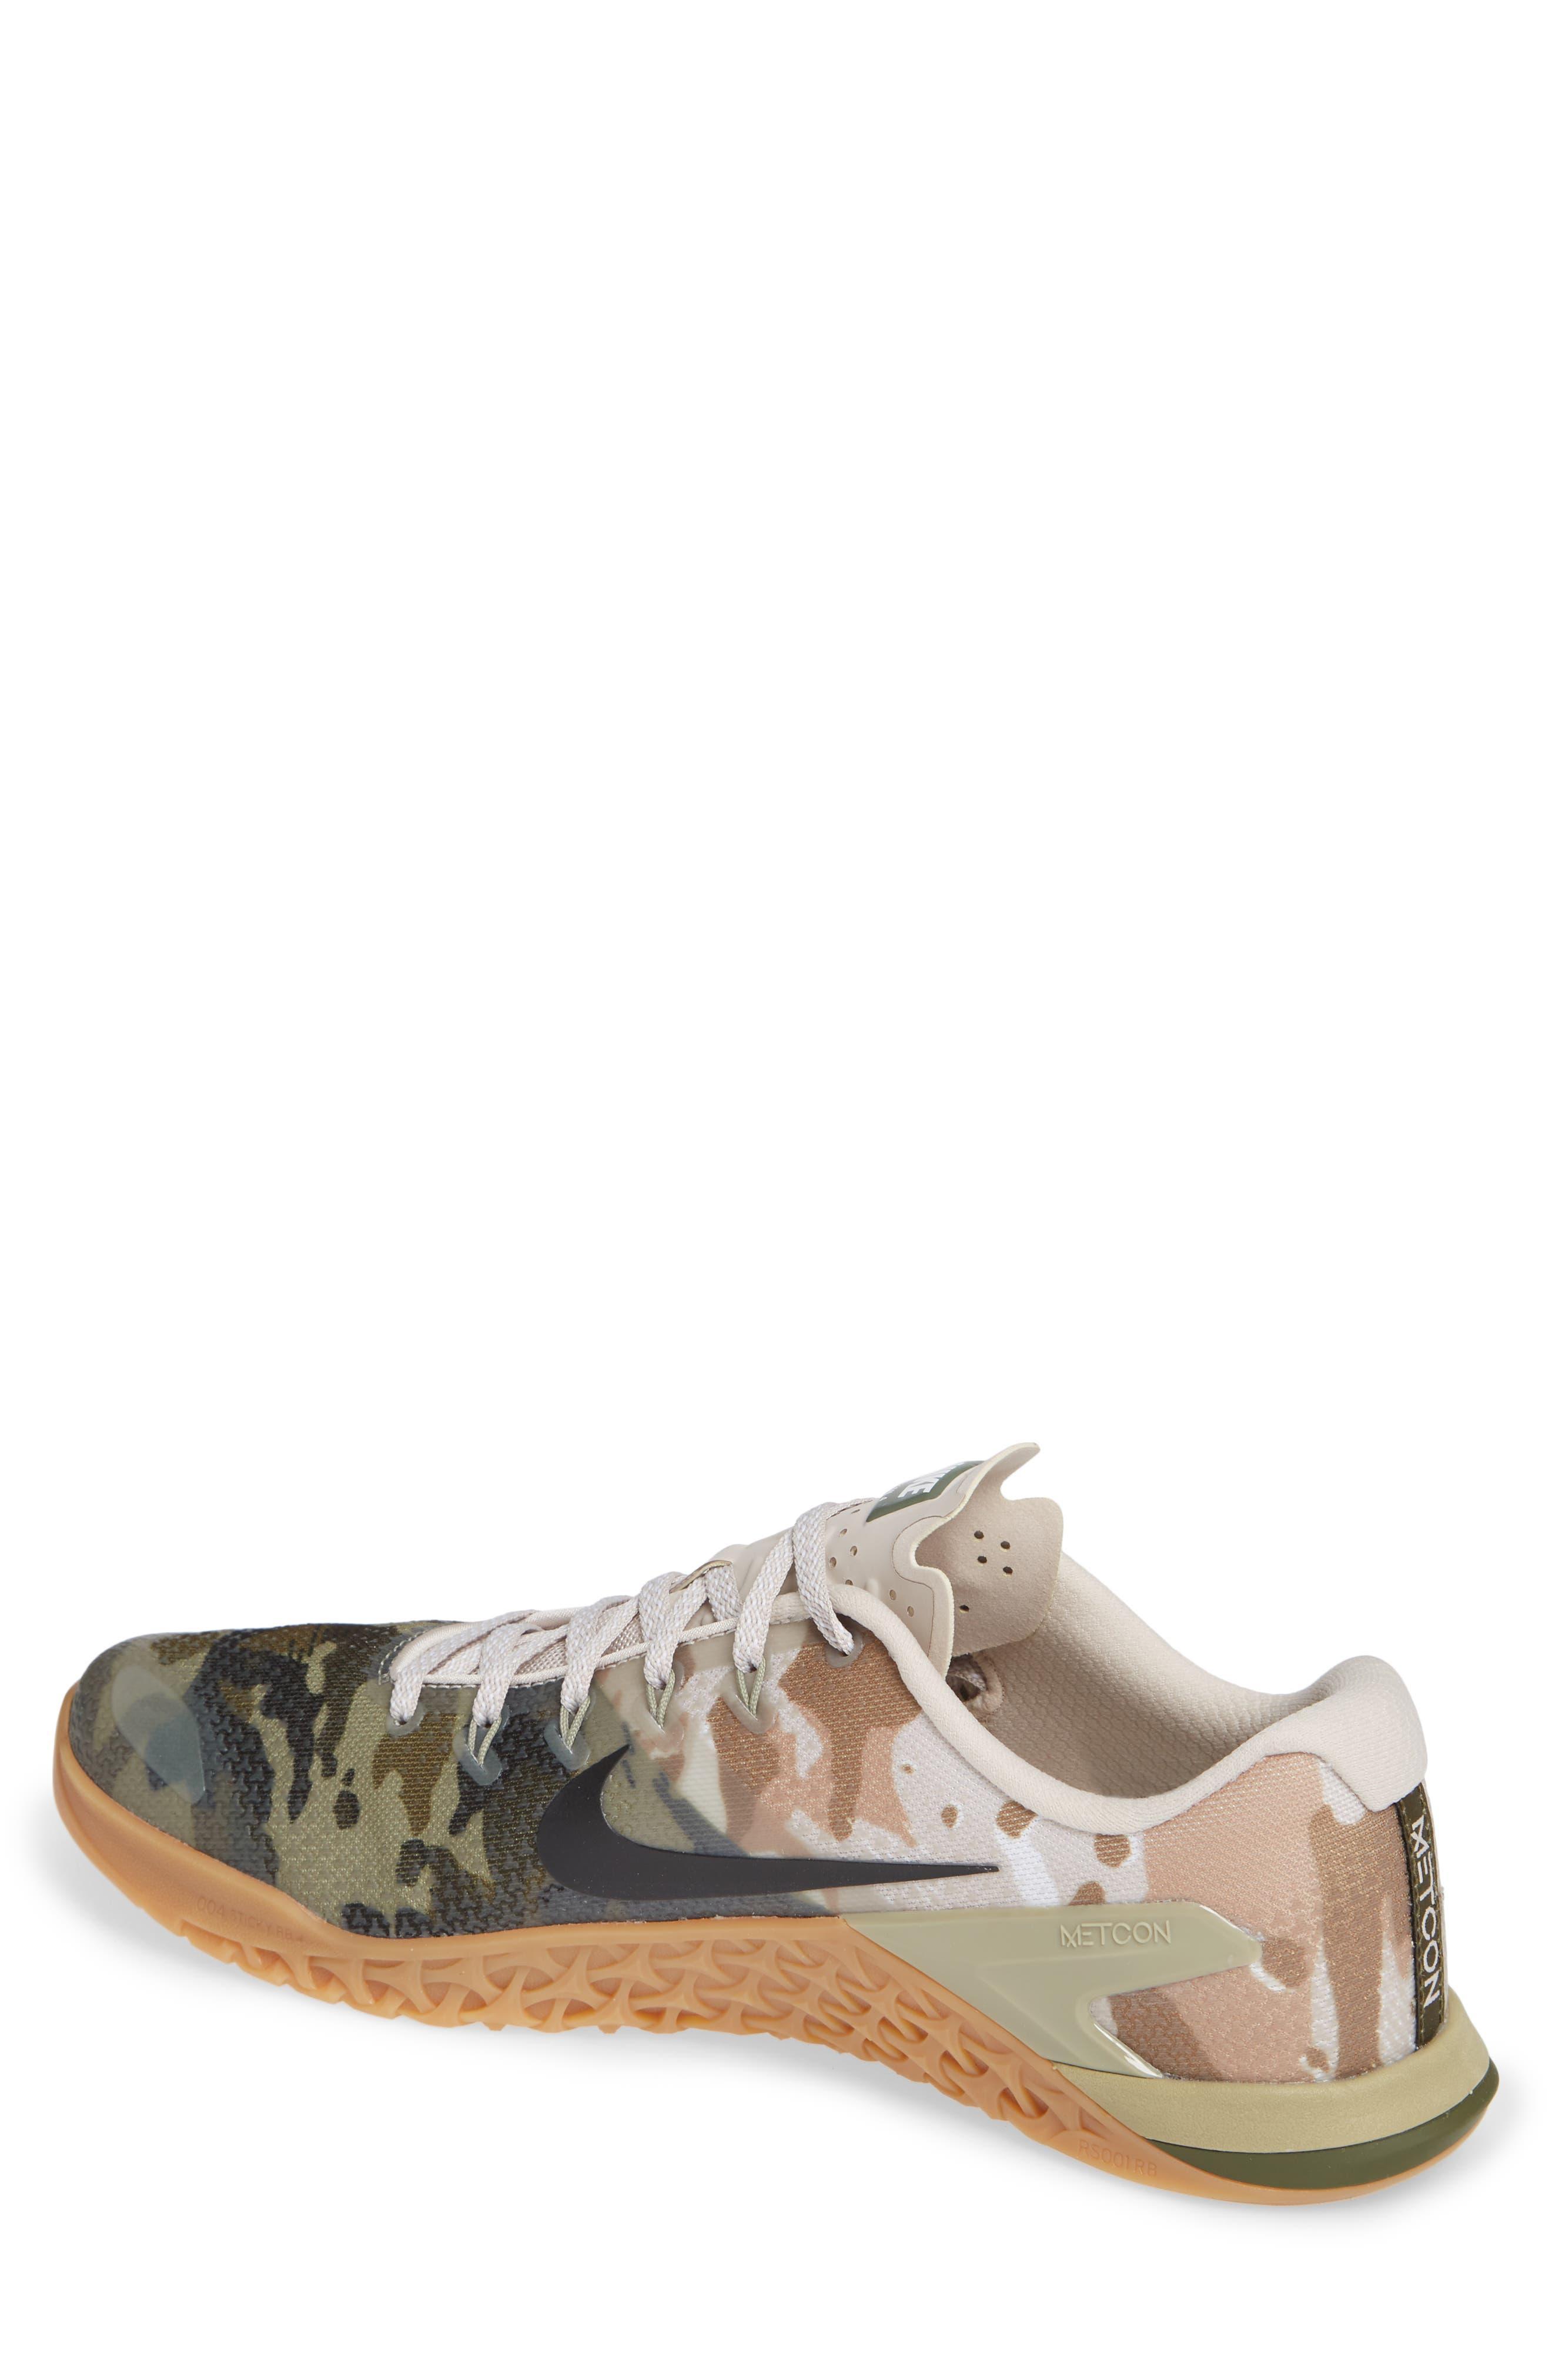 Metcon 4 Training Shoe,                             Alternate thumbnail 32, color,